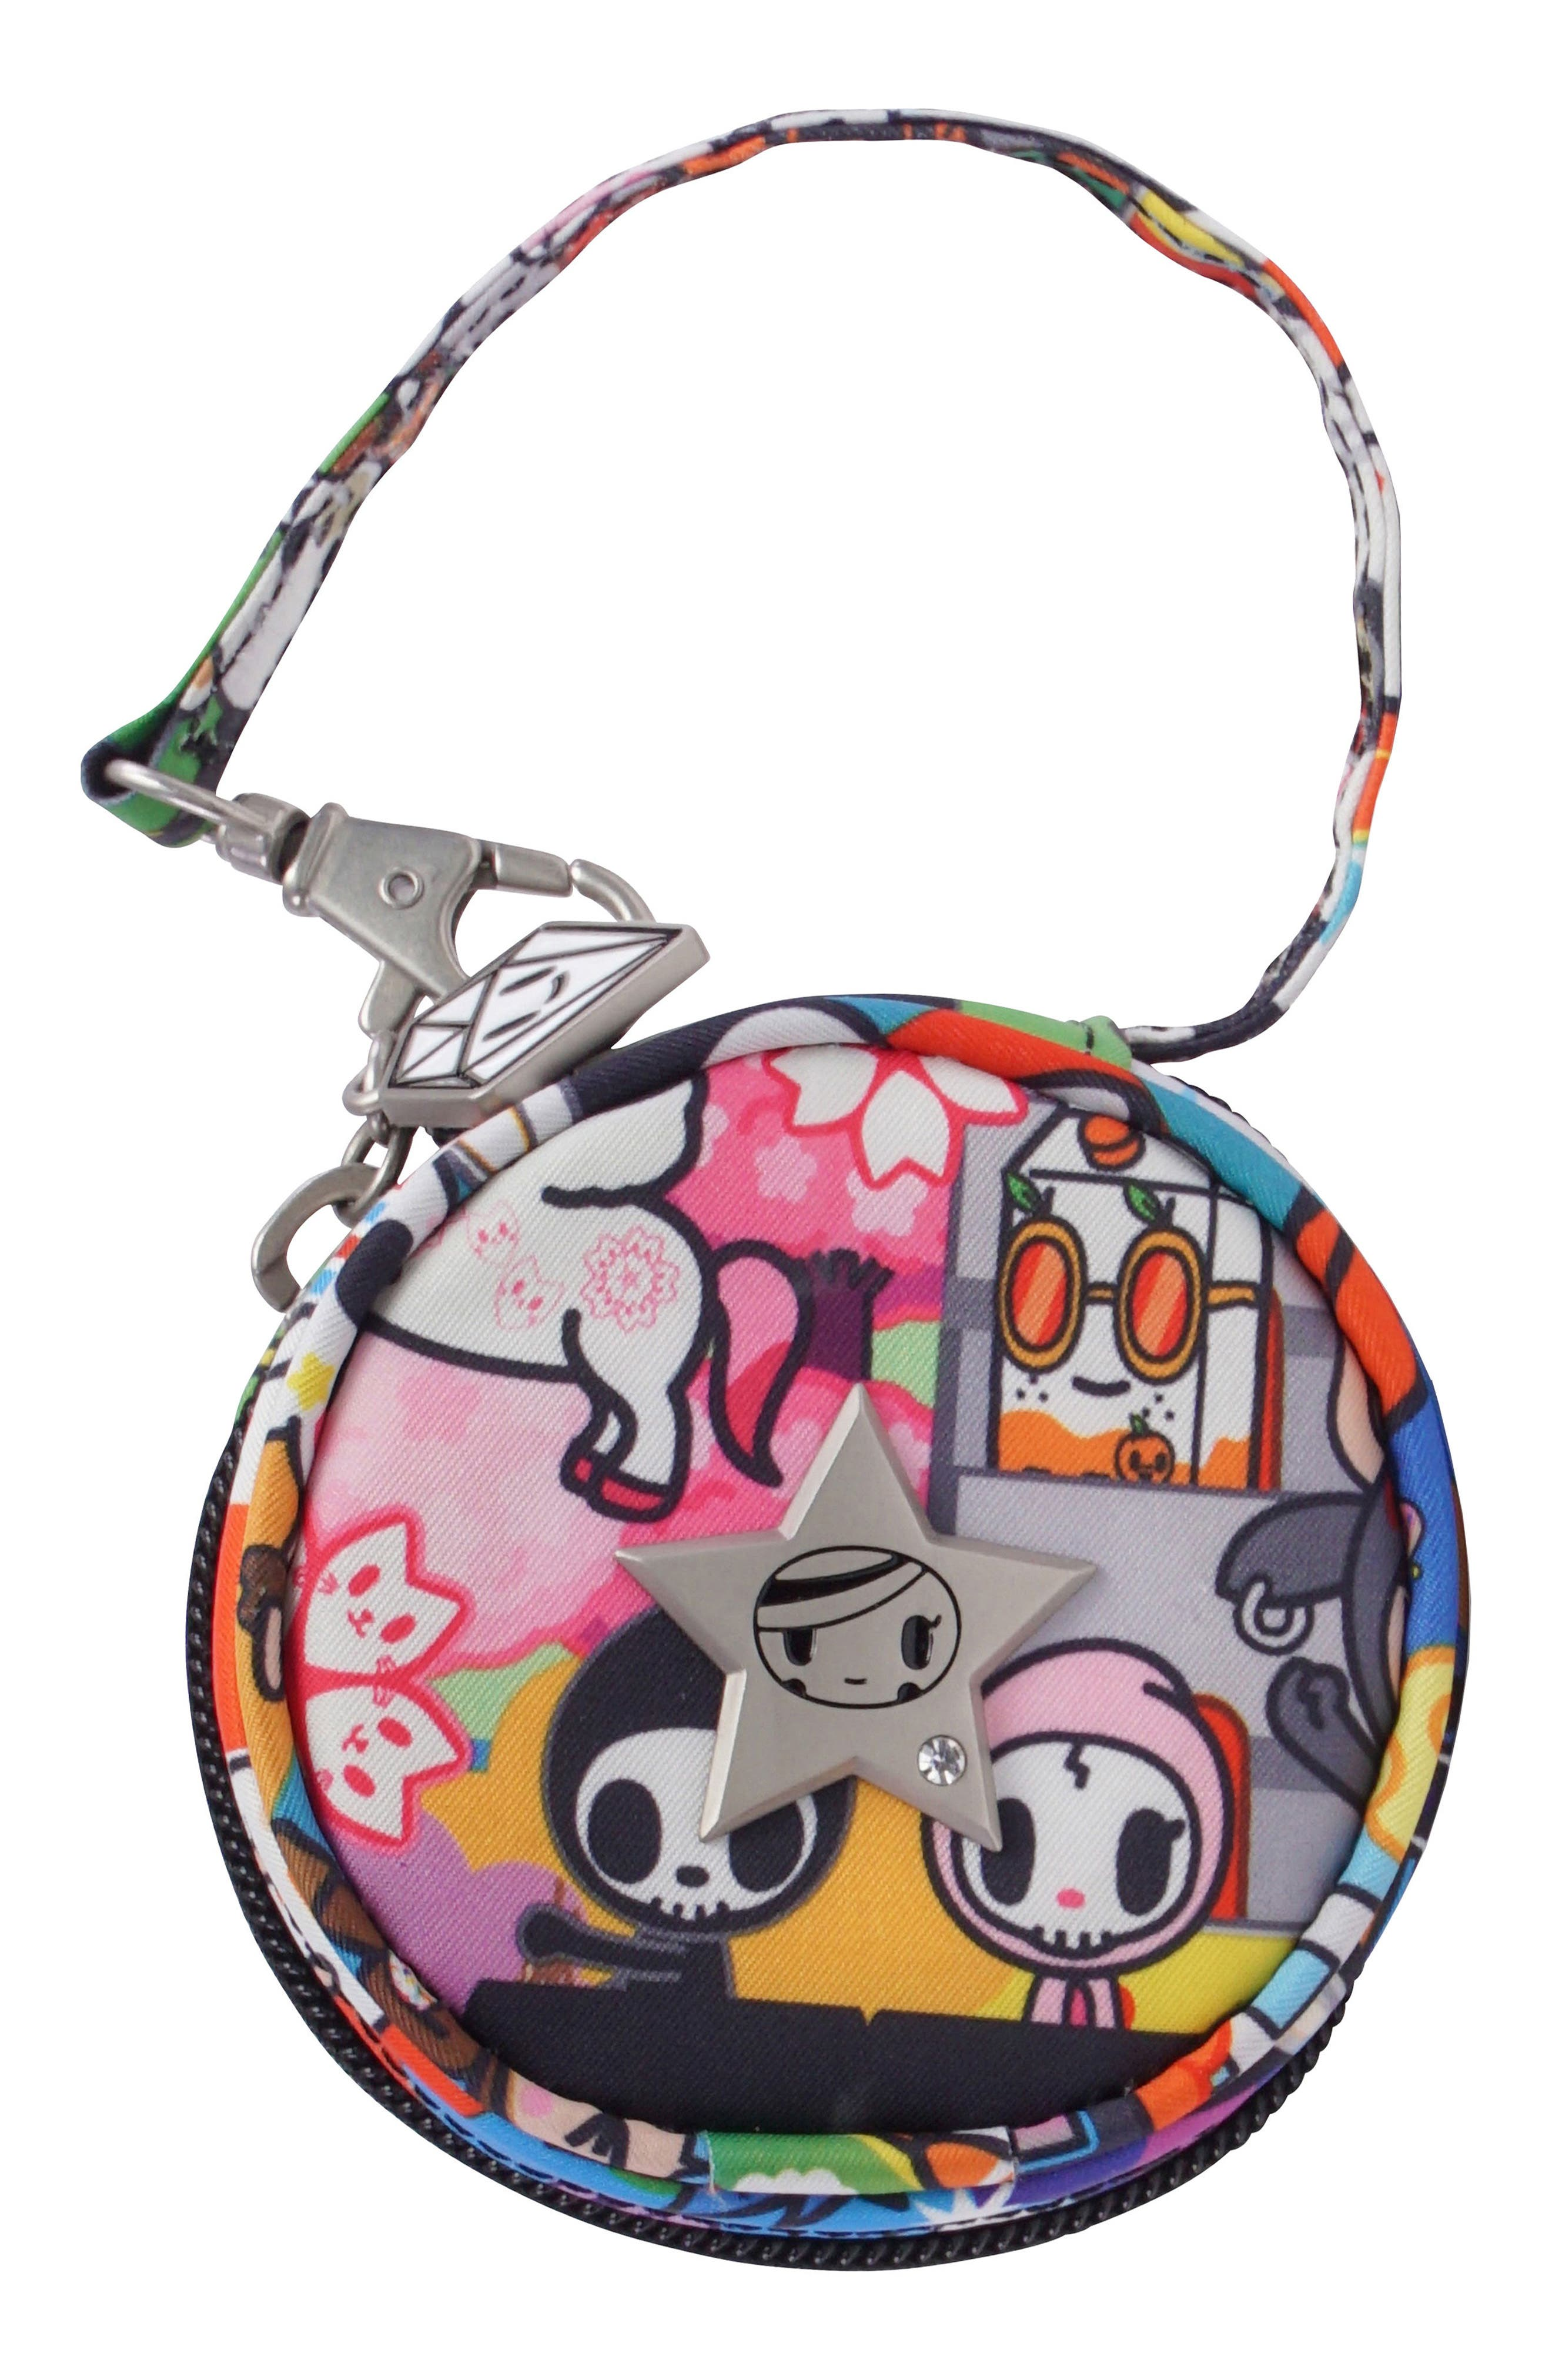 Alternate Image 1 Selected - tokidoki x Ju-Ju-Be 'Fuel Cell' Lunch Bag